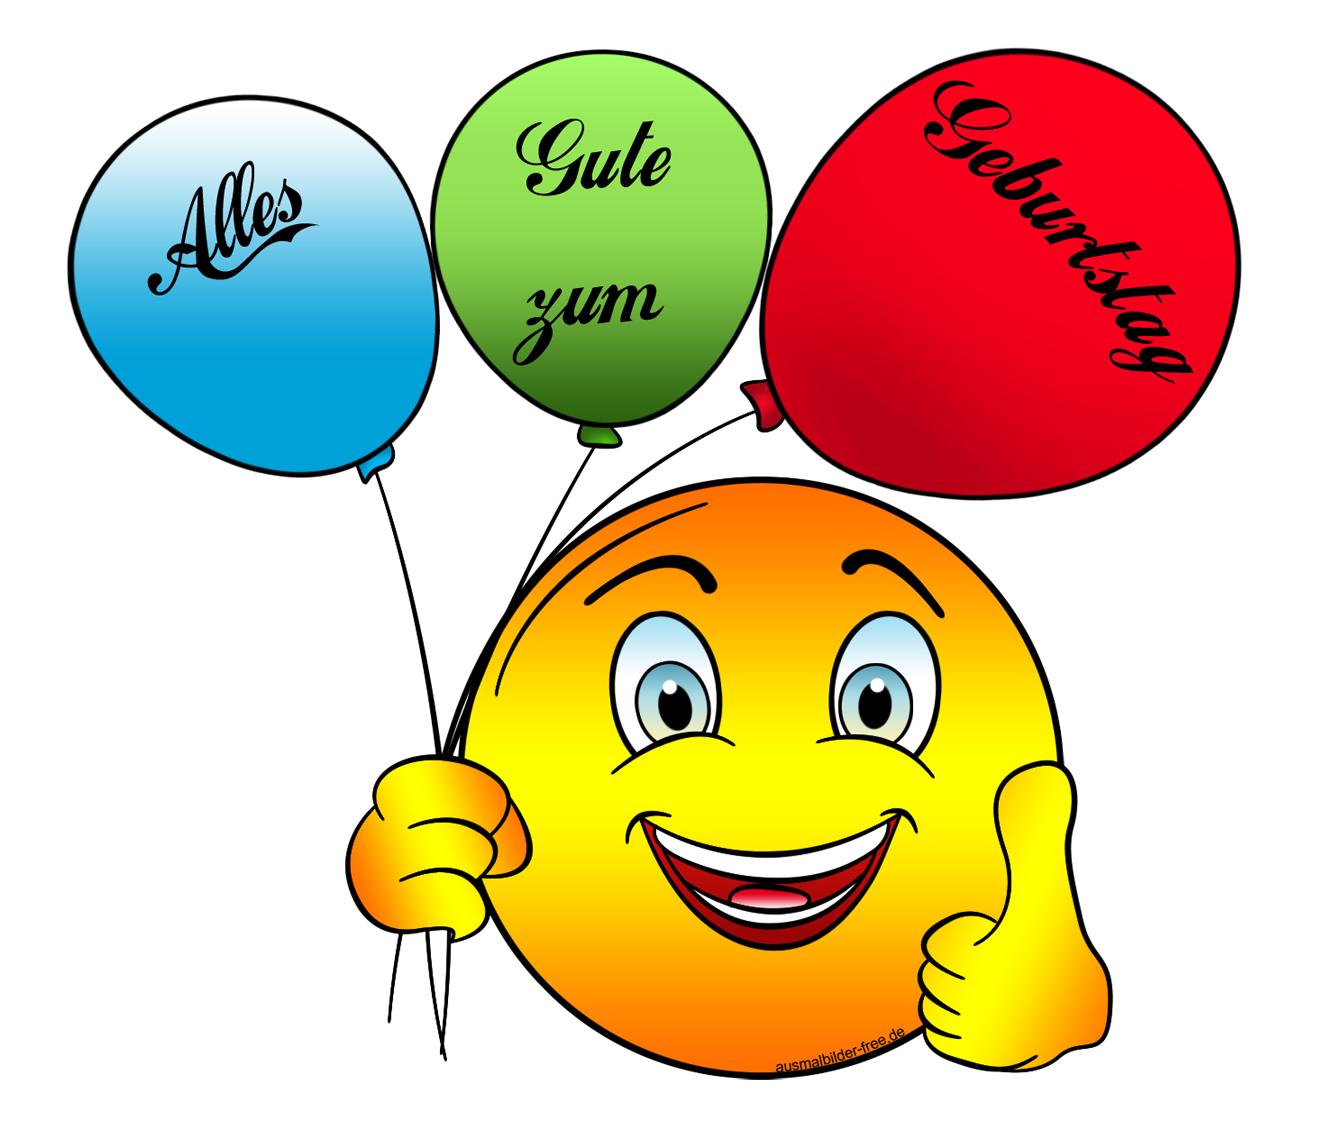 001-smiley-geburtstag-malvorlagen-comik-ausmalbildder-karikatur ...